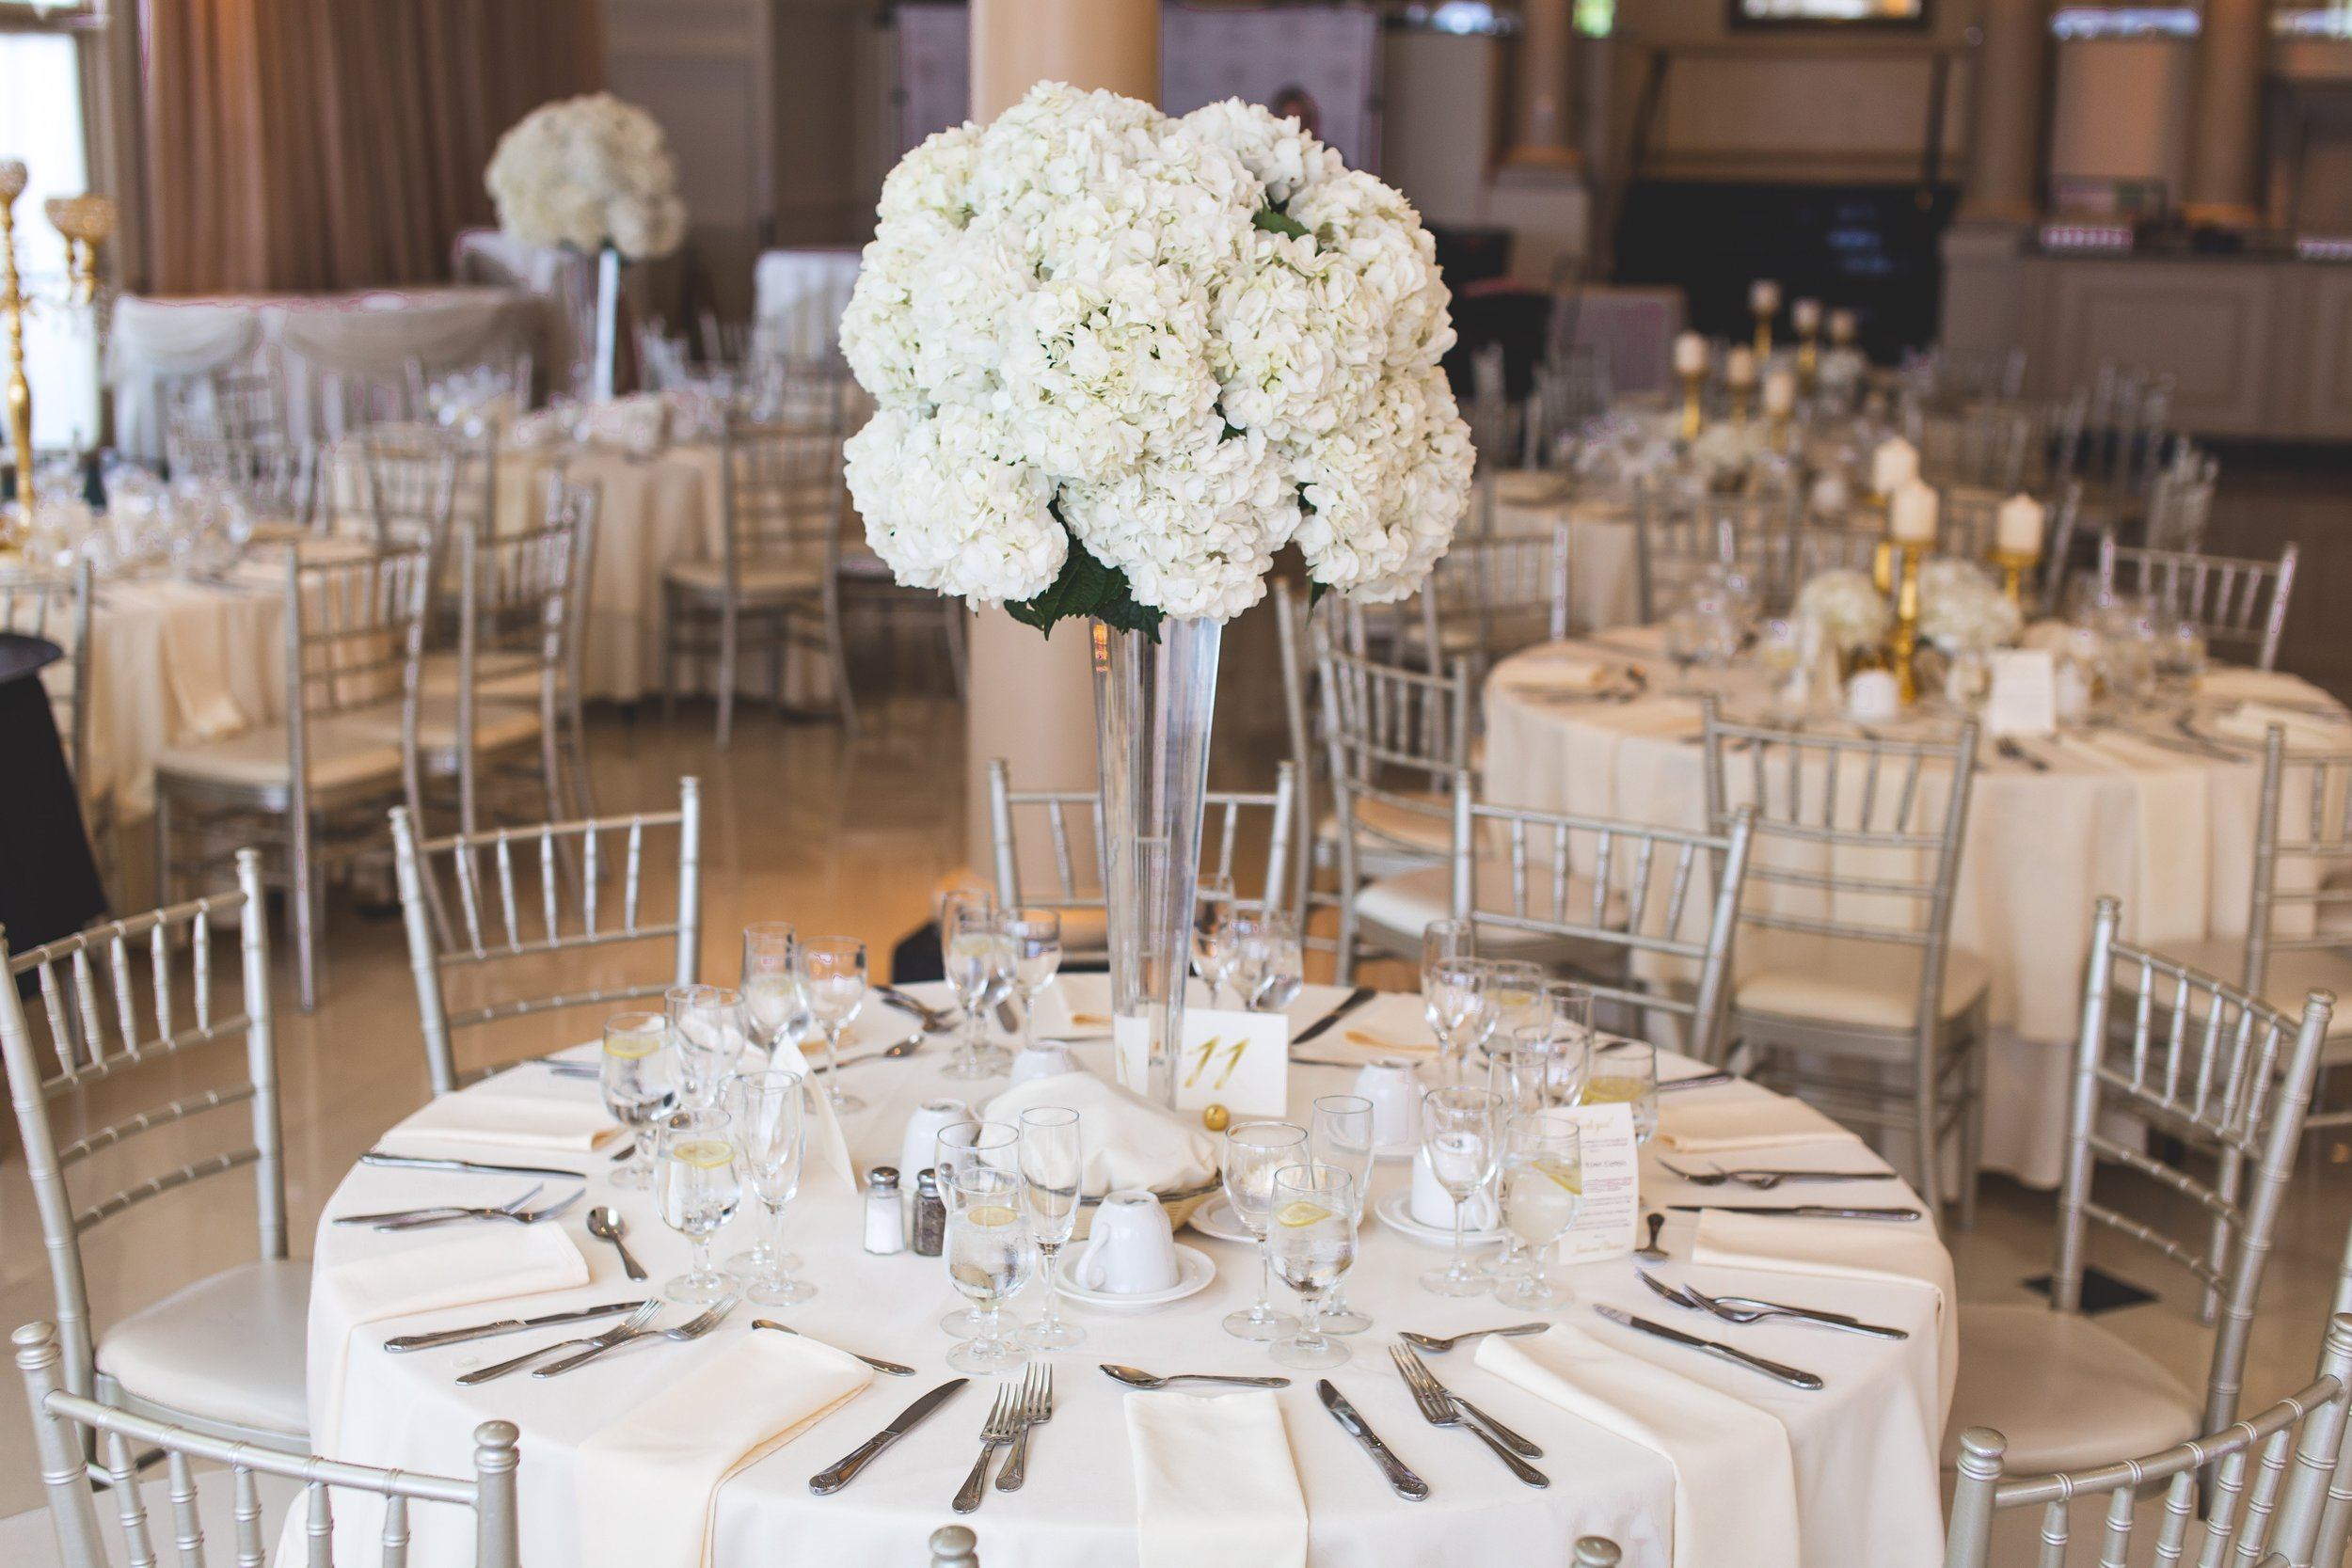 banquet-beautiful-catering-2306281.jpg